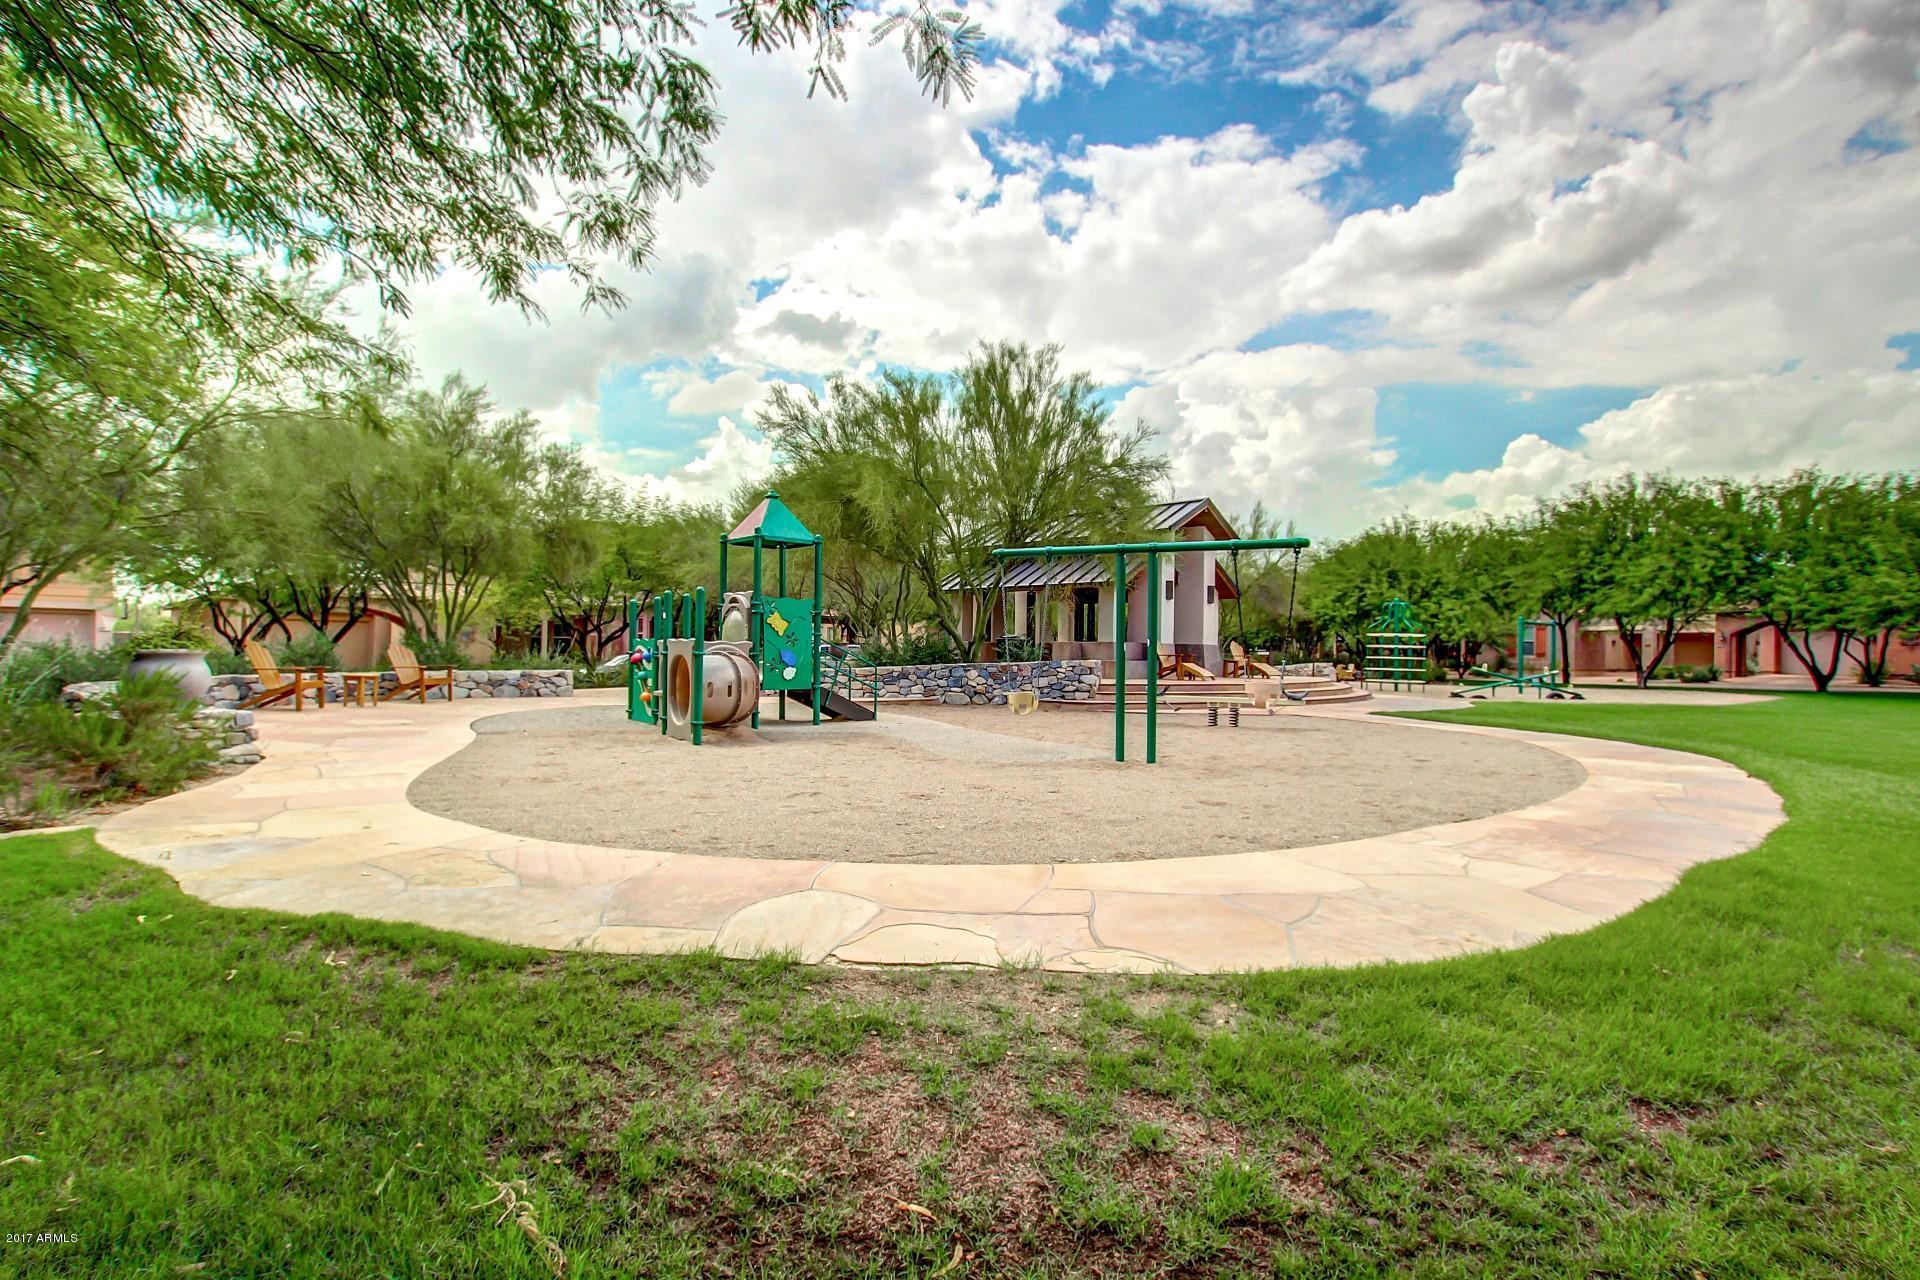 9311 E Via de Vaquero Drive Scottsdale, AZ 85255 - MLS #: 5638249